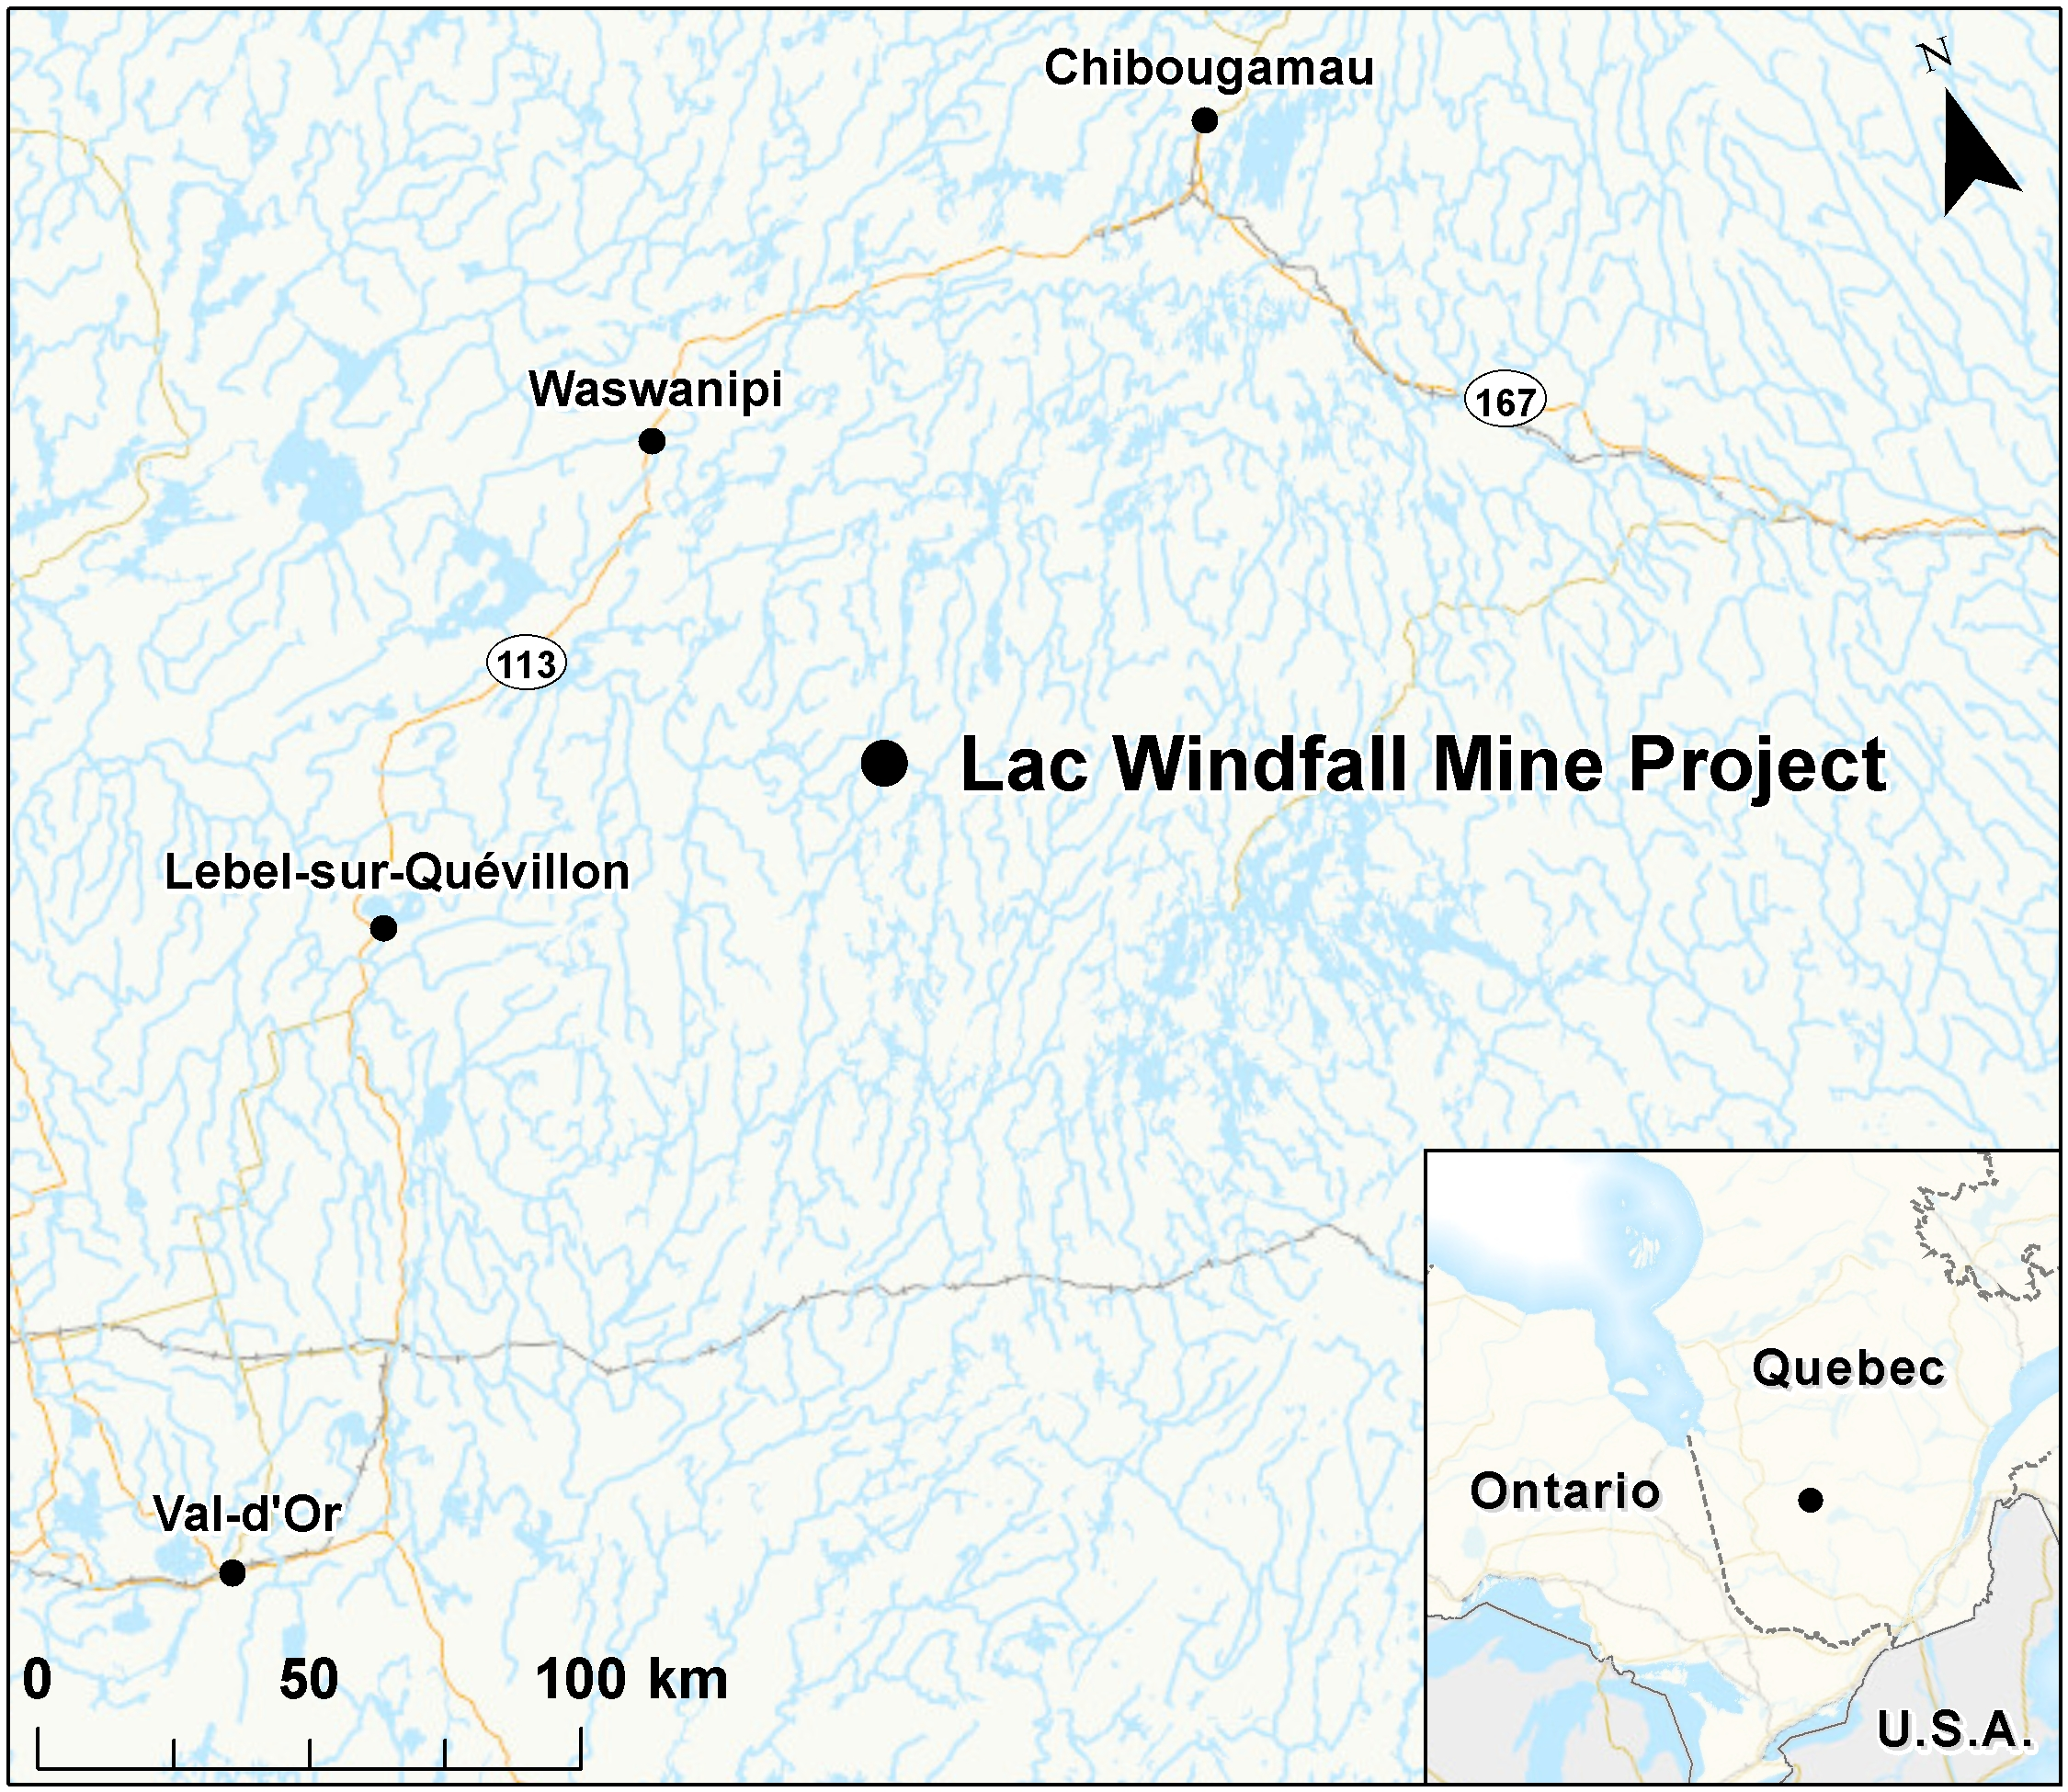 Lac Windfall Mine Location